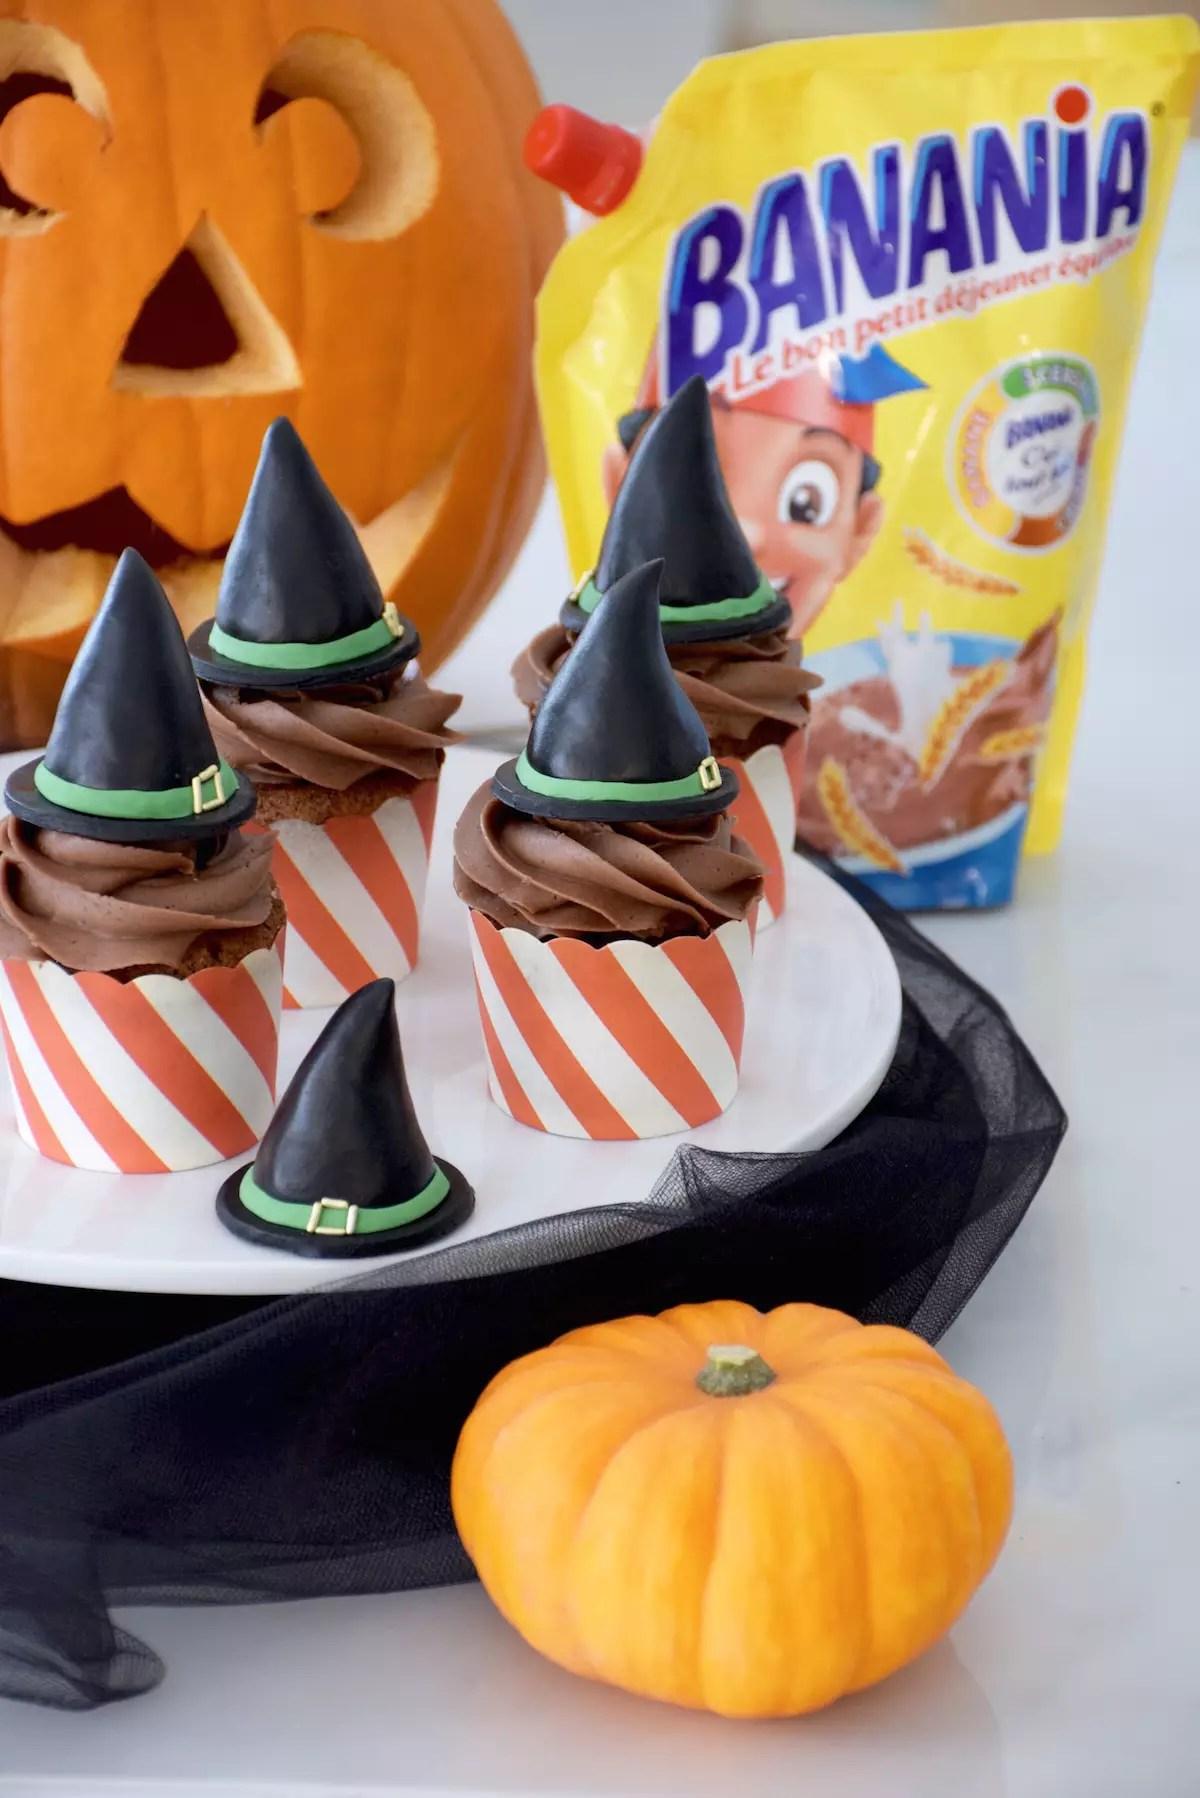 Cupcakes au Banania pour Halloween